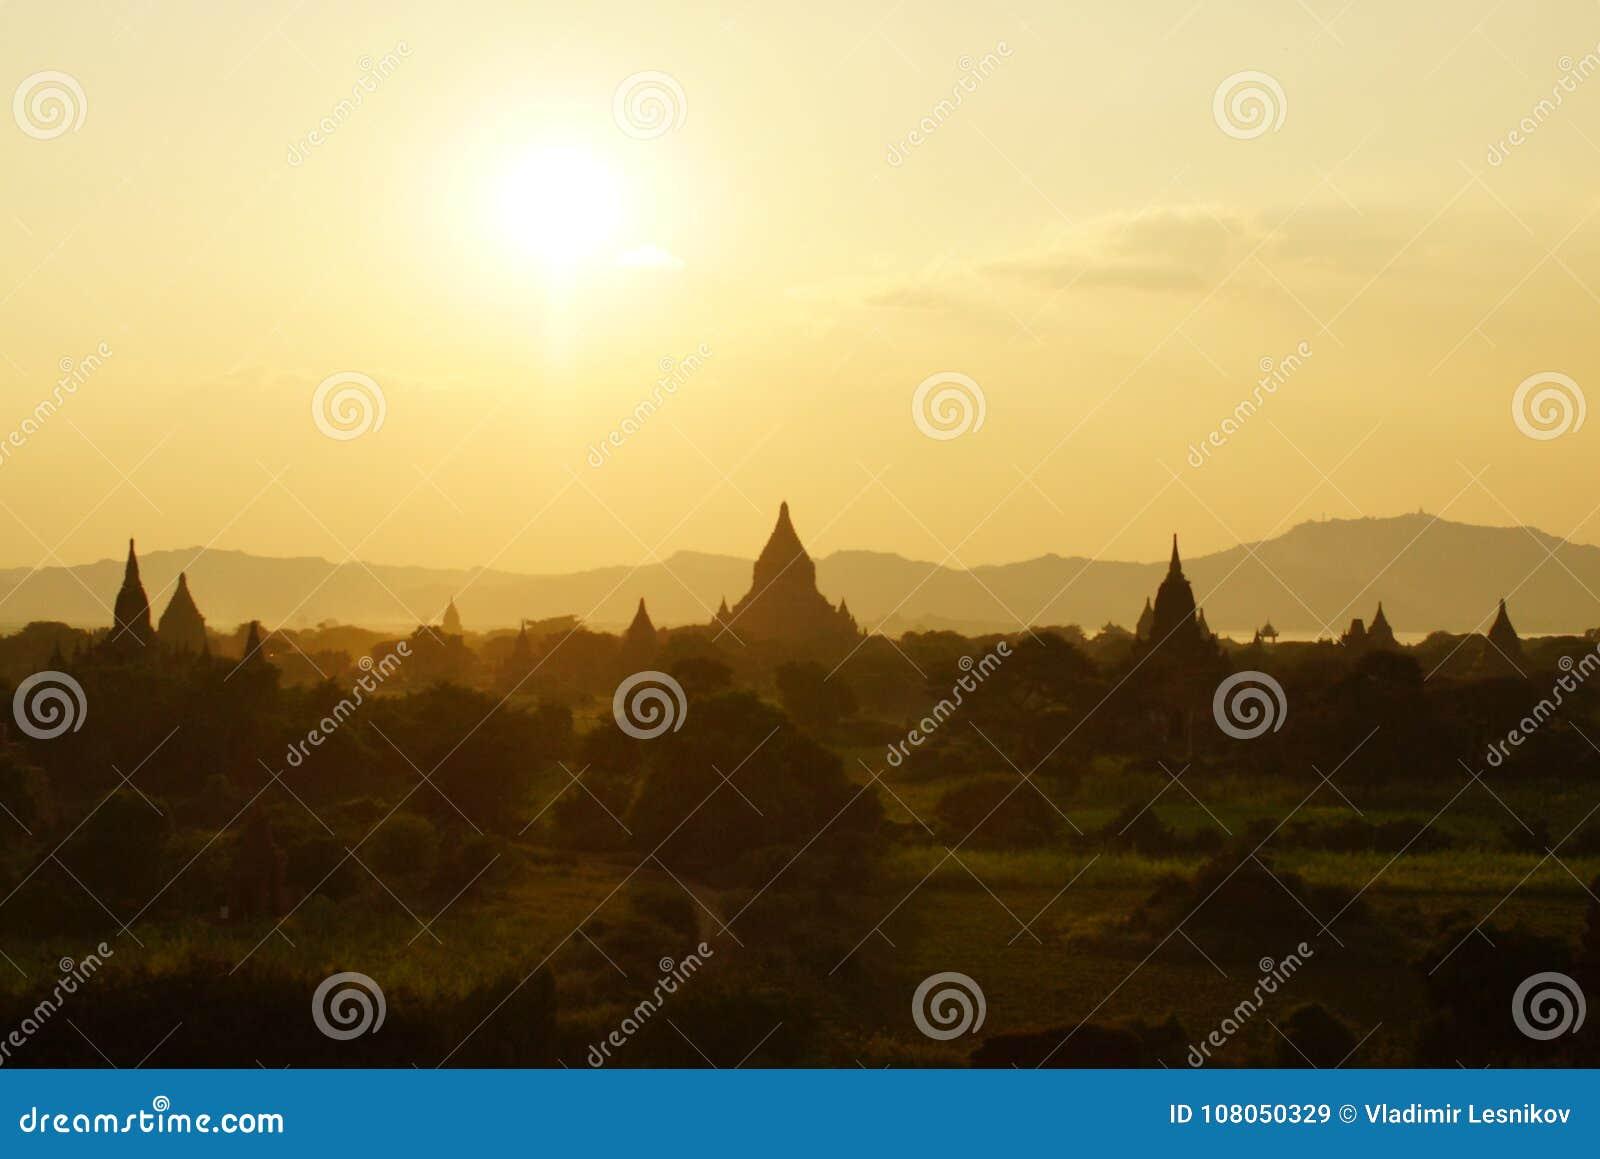 Bagan πριν από το ηλιοβασίλεμα, Βιρμανία, Ασία